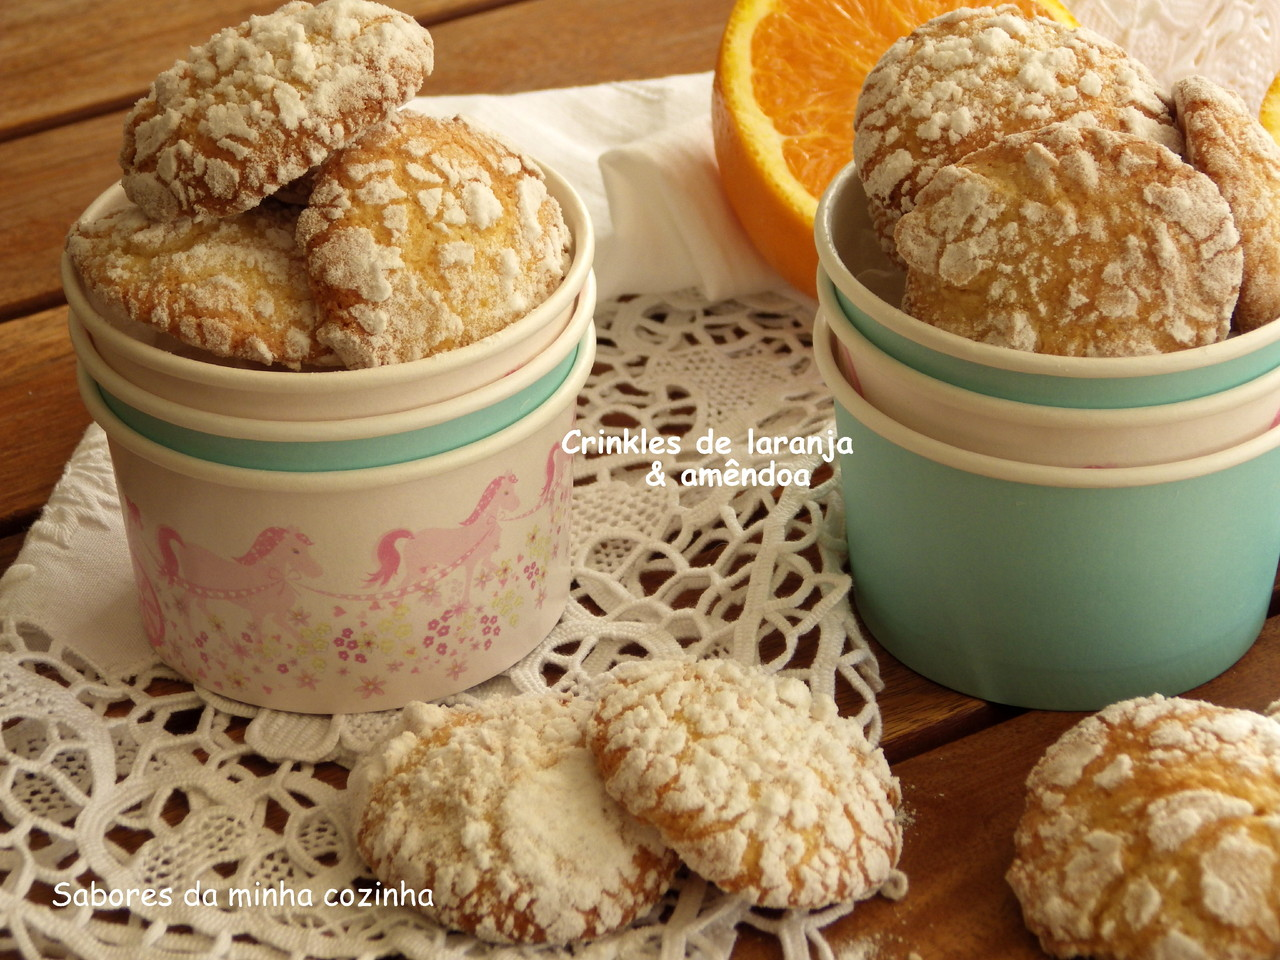 IMGP6319-Crinkles de laranja & amêndoa-Blog.JPG